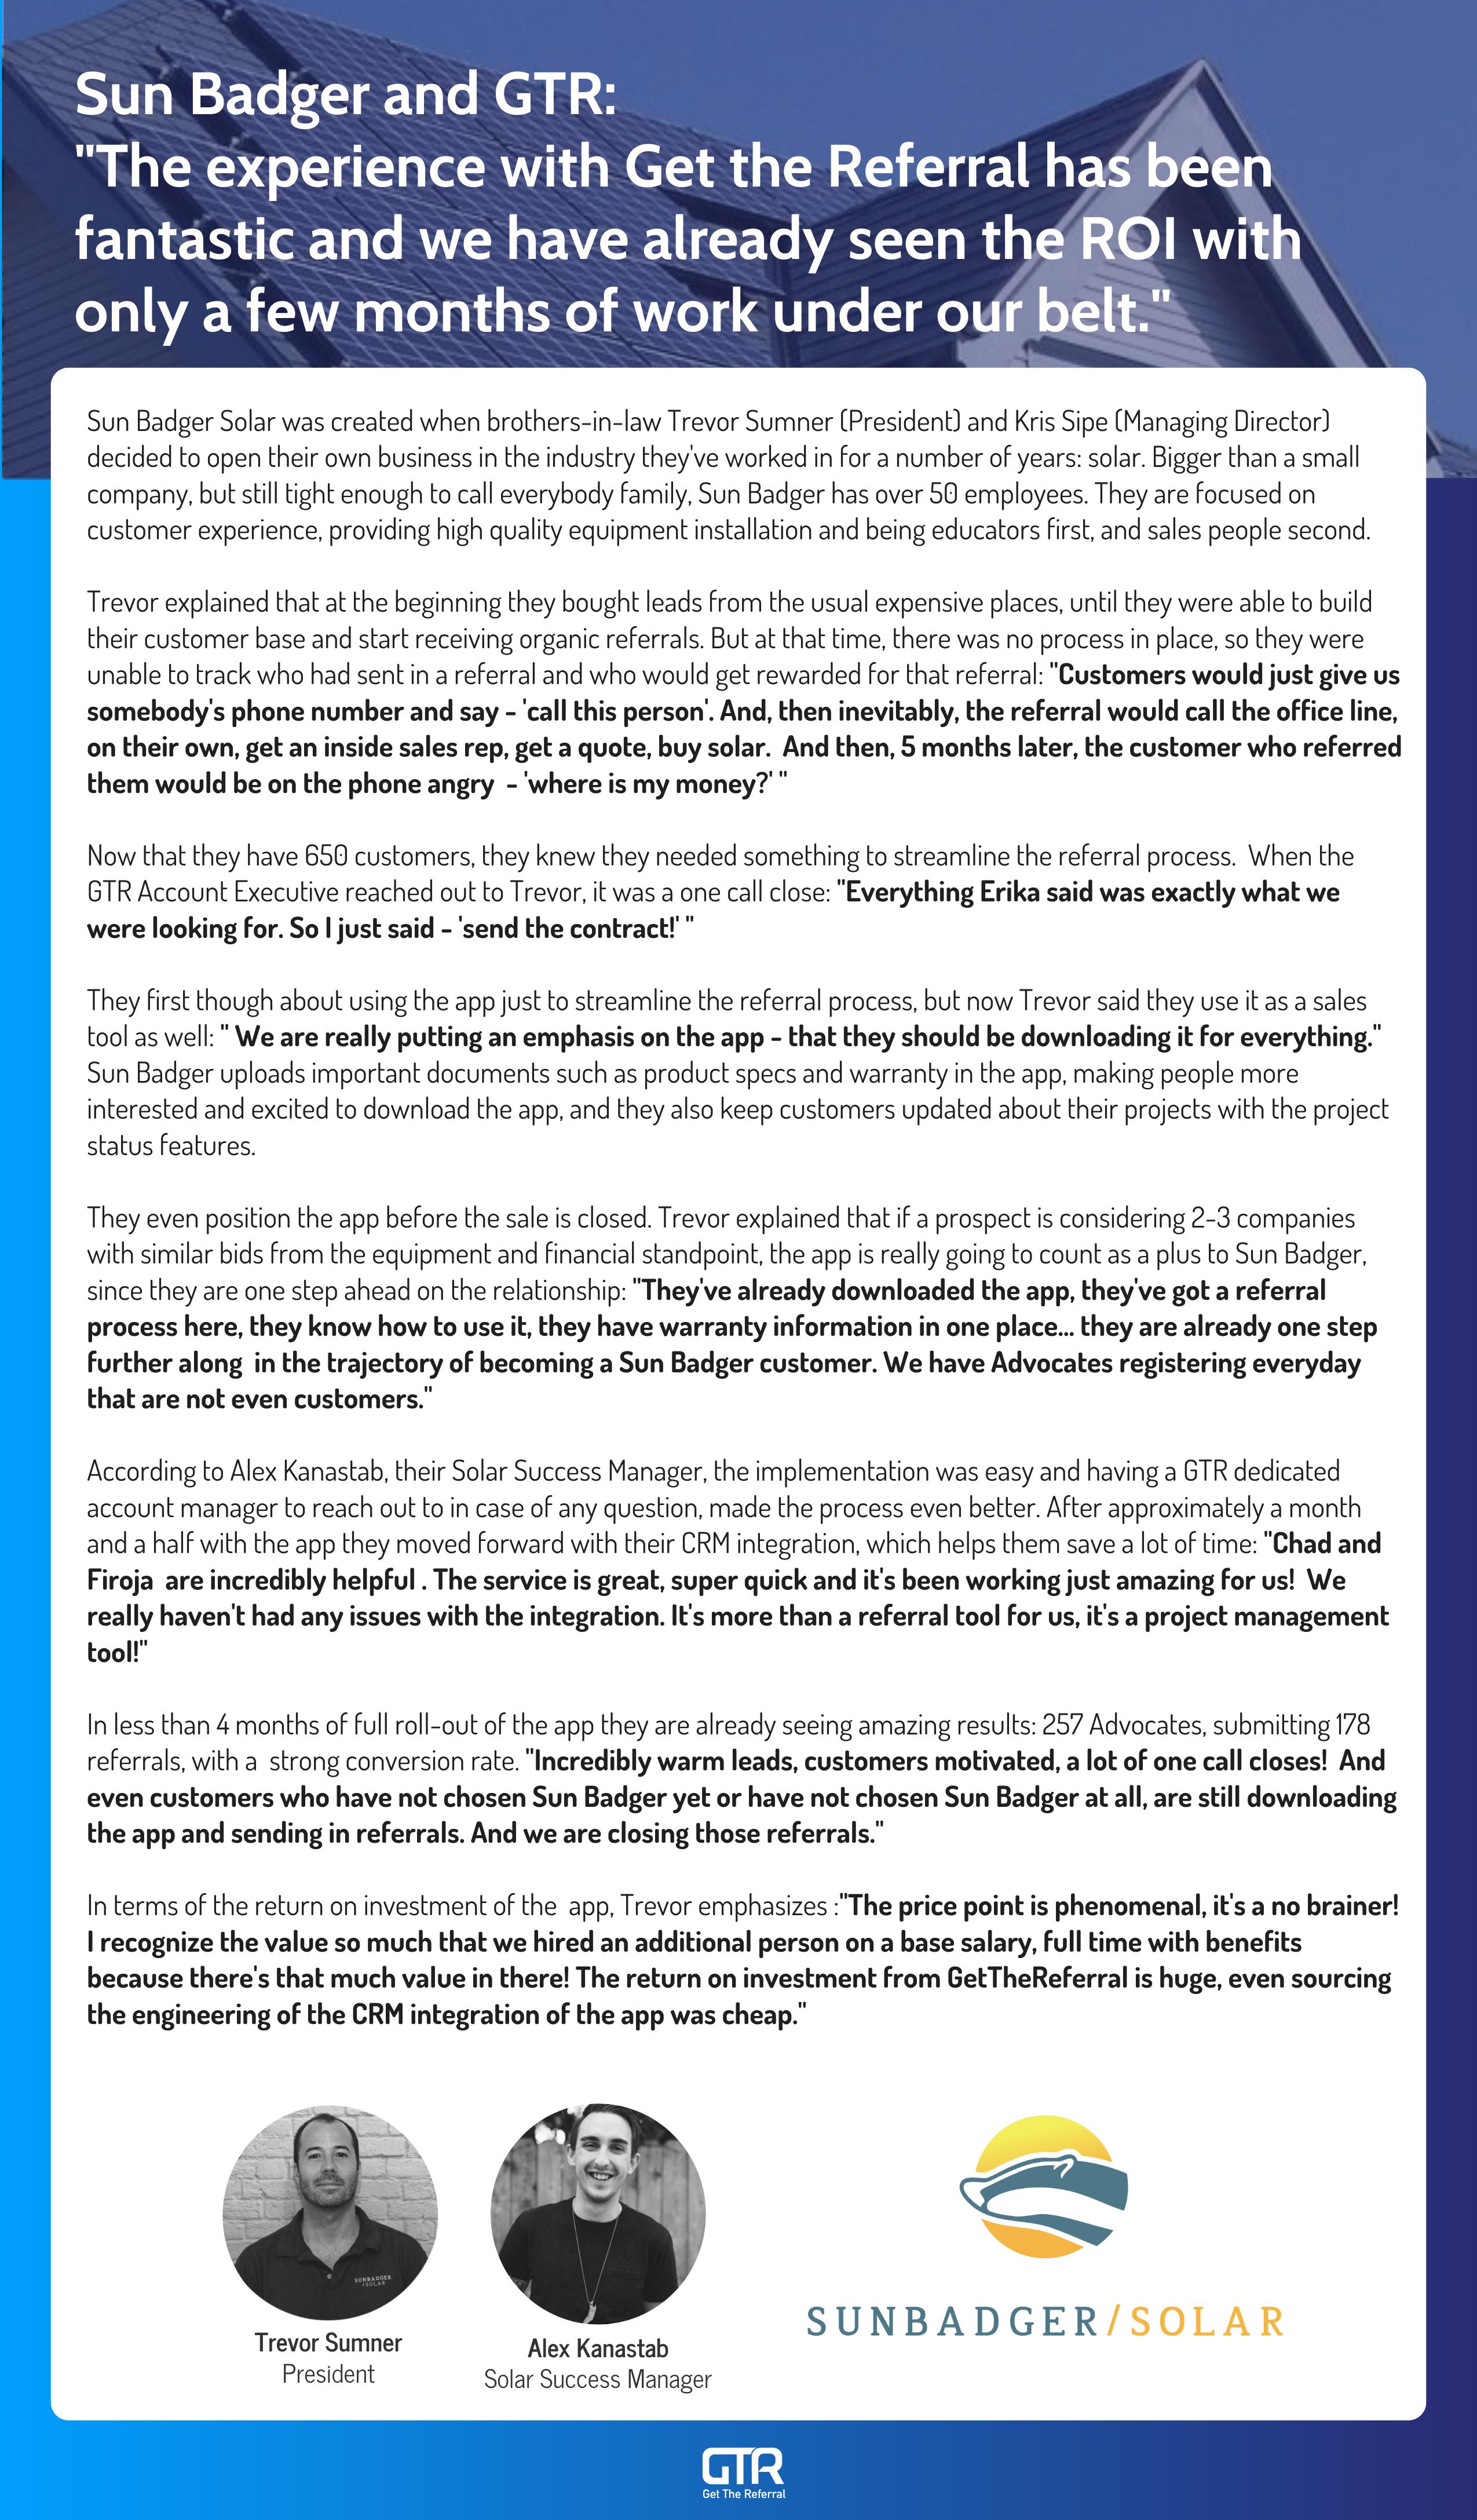 Sun Badger Success Story with GTR